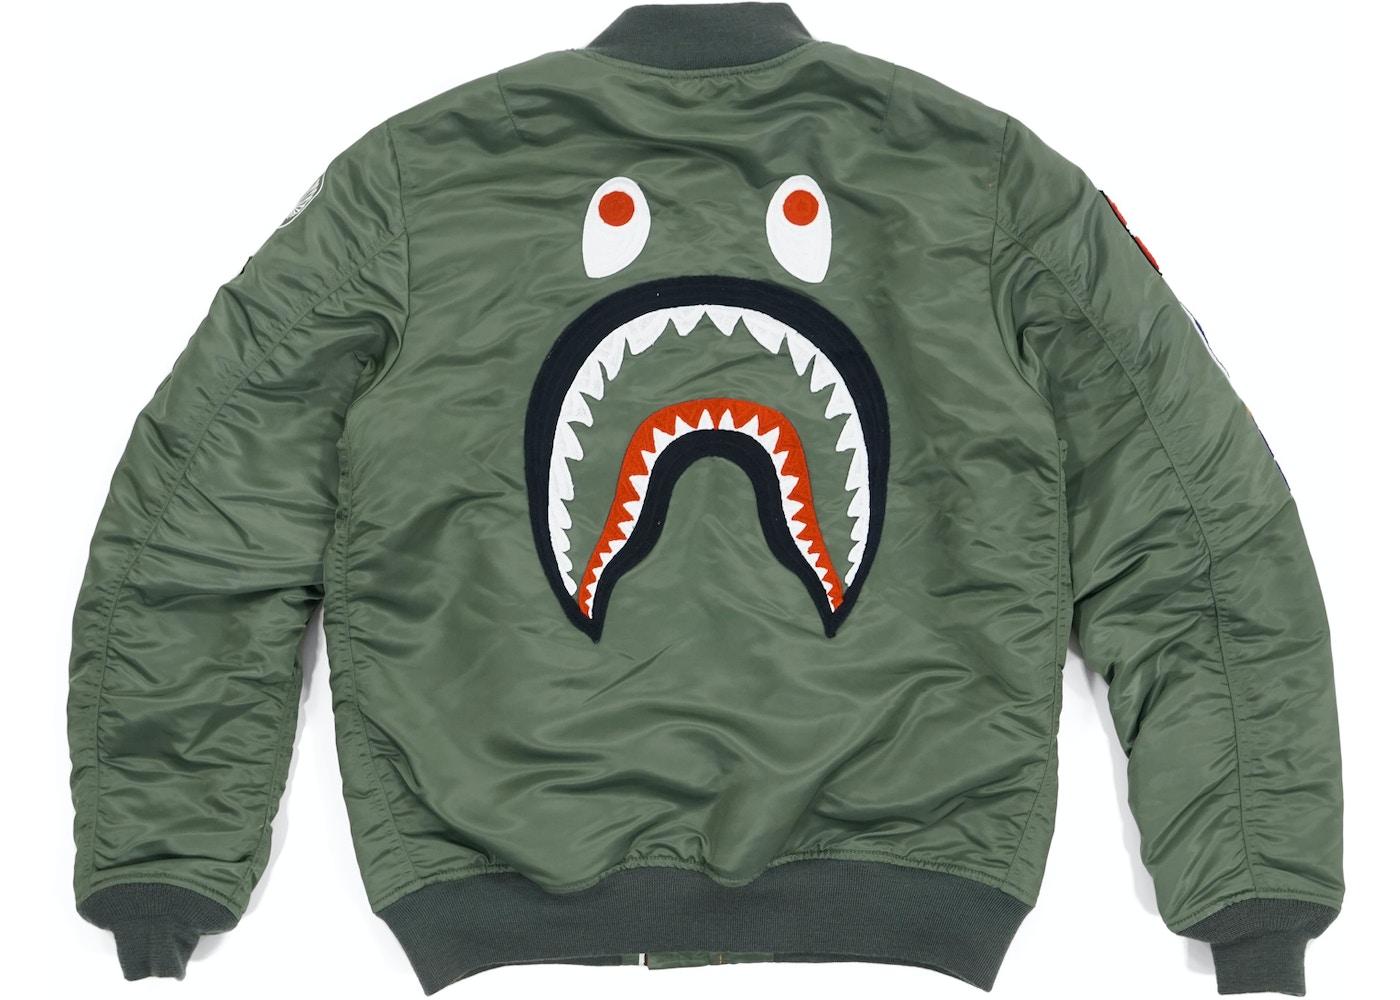 c486ec7fd1a80 Streetwear - Bape Jackets - New Highest Bids